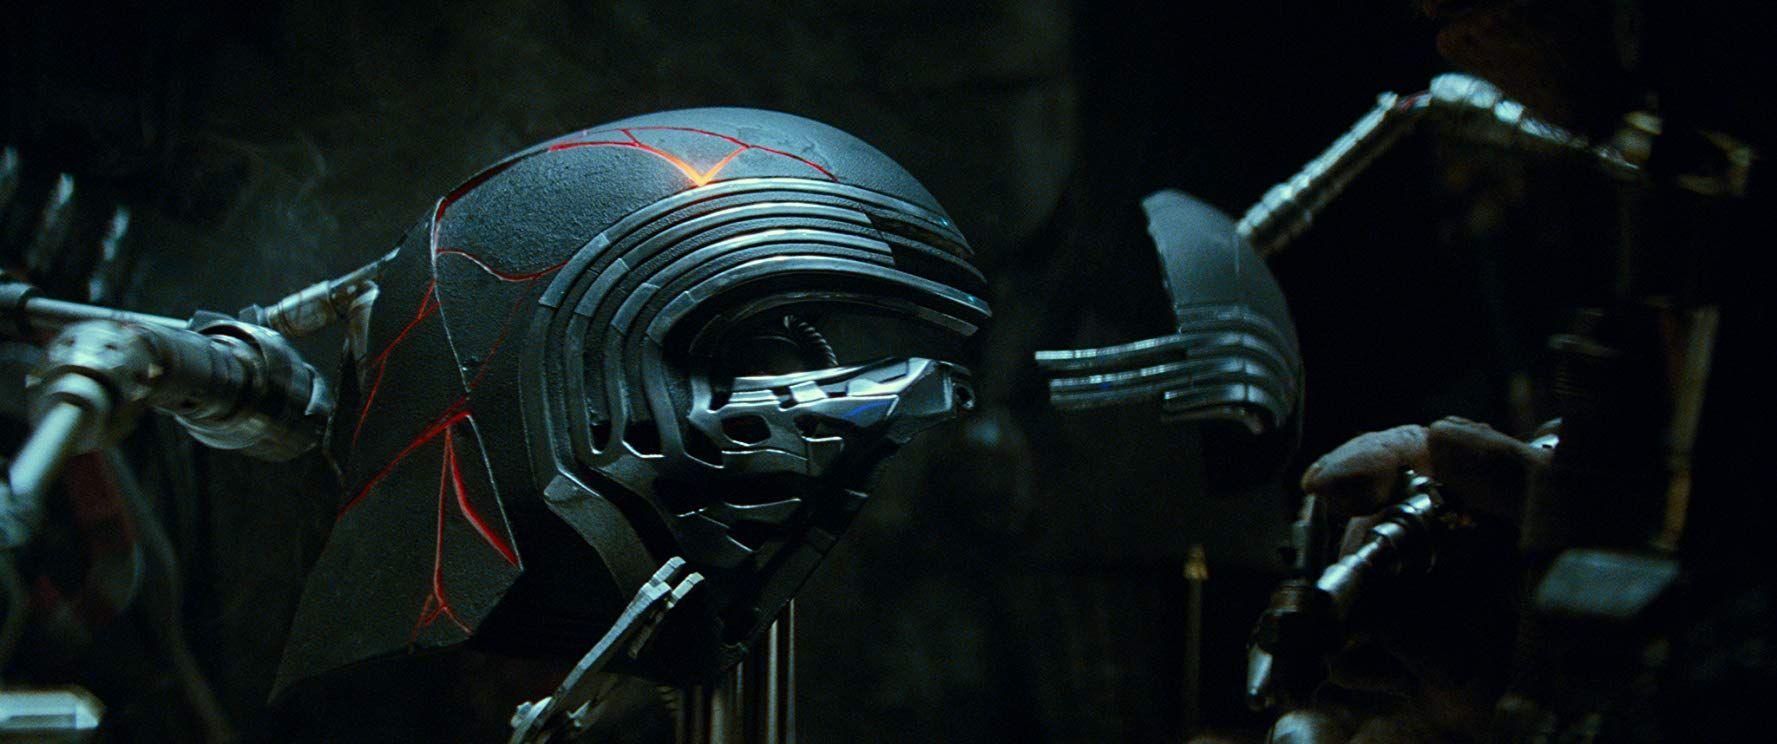 Imagen 10 de Star Wars: El Ascenso de Skywalker